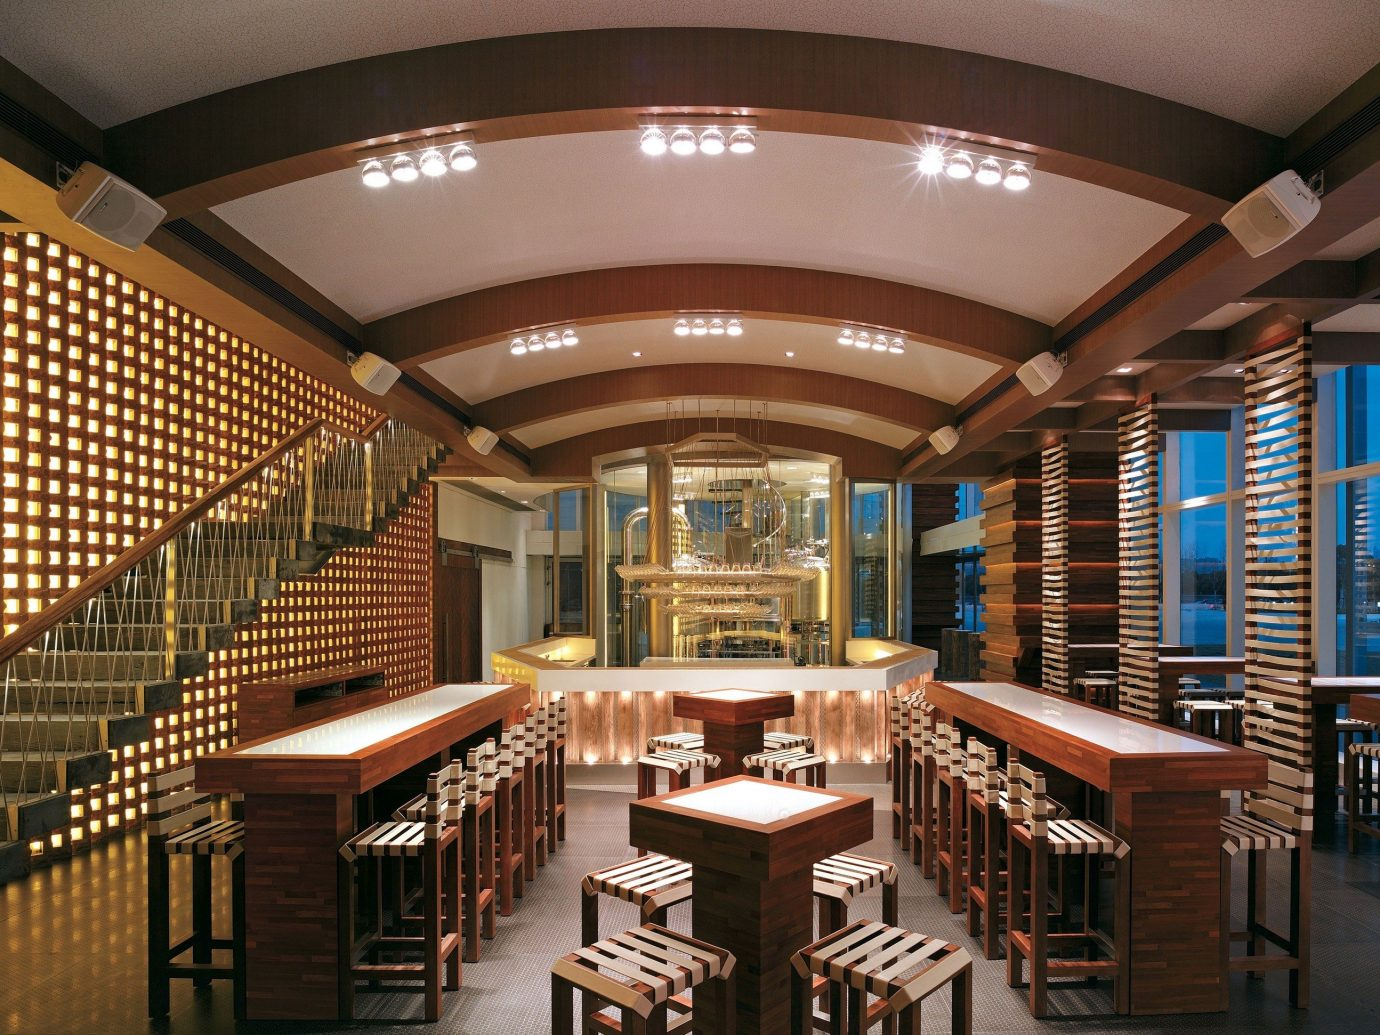 Food + Drink indoor ceiling floor library building auditorium Lobby interior design convention center conference hall estate furniture